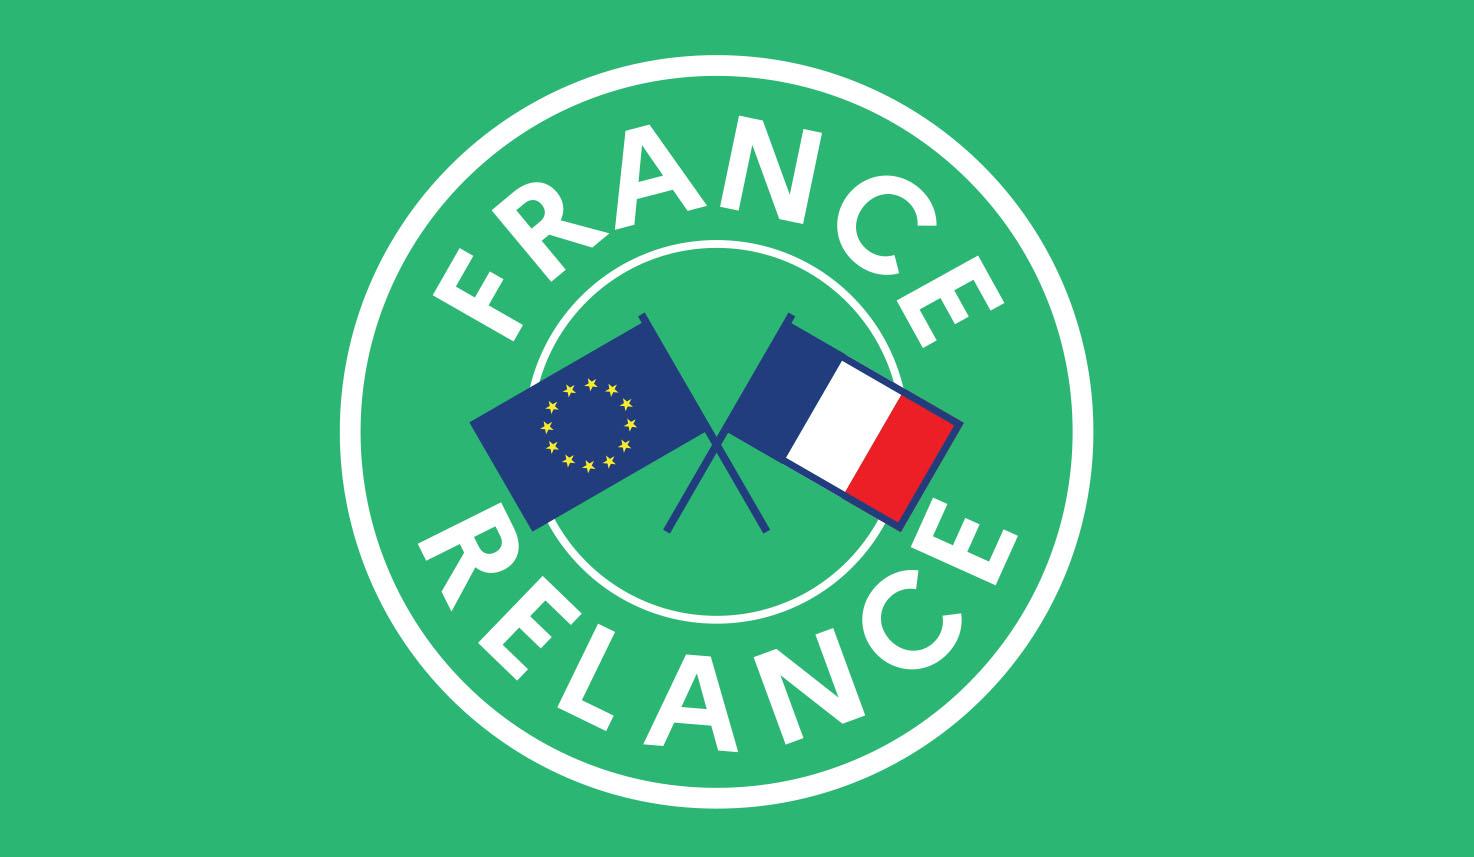 France Relance : accompagner la croissance des TPE/PME